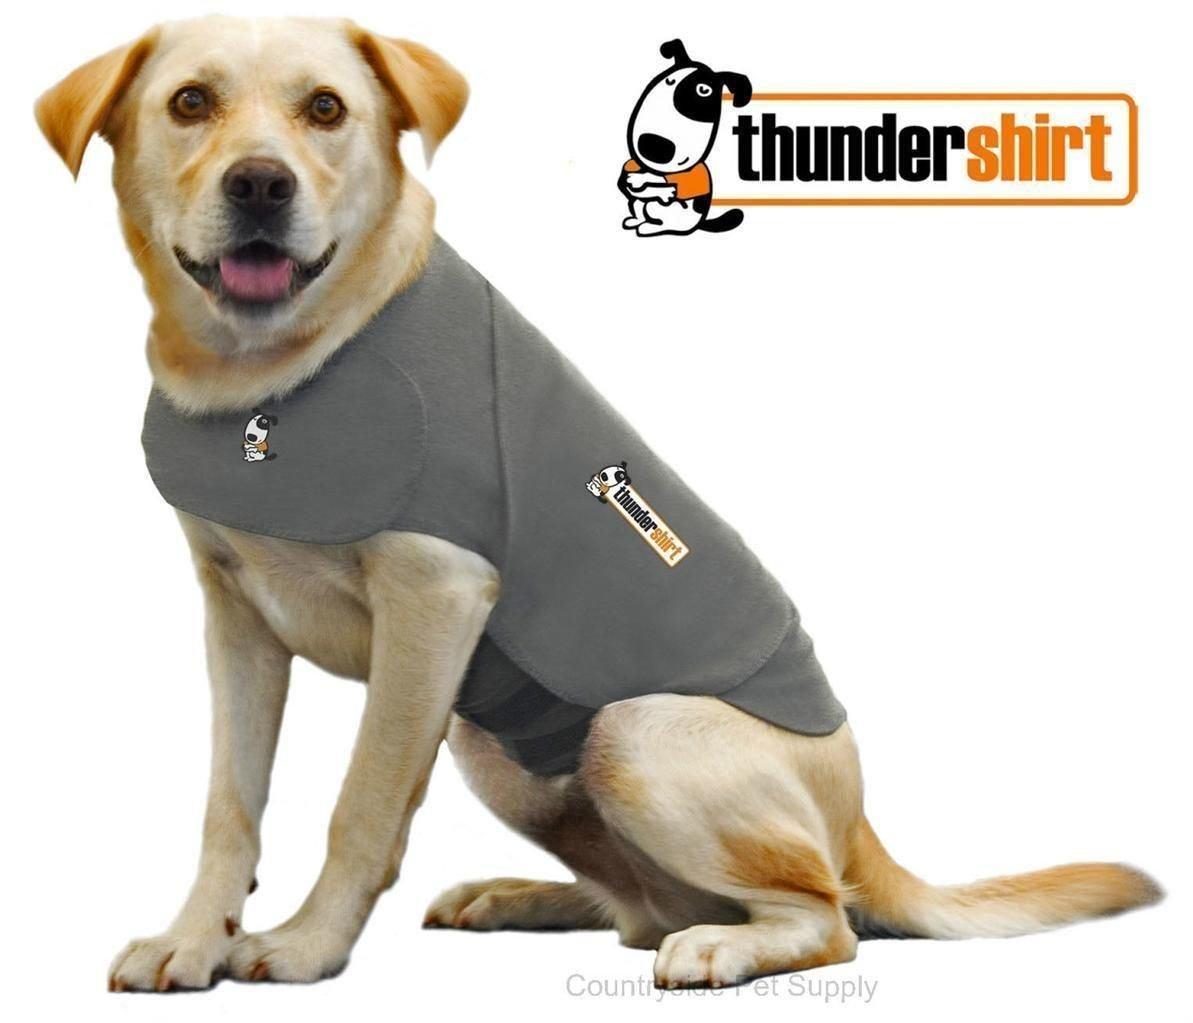 Thundershirt Dog Anxiety Treatment Heather Grey Size Large by Destinie